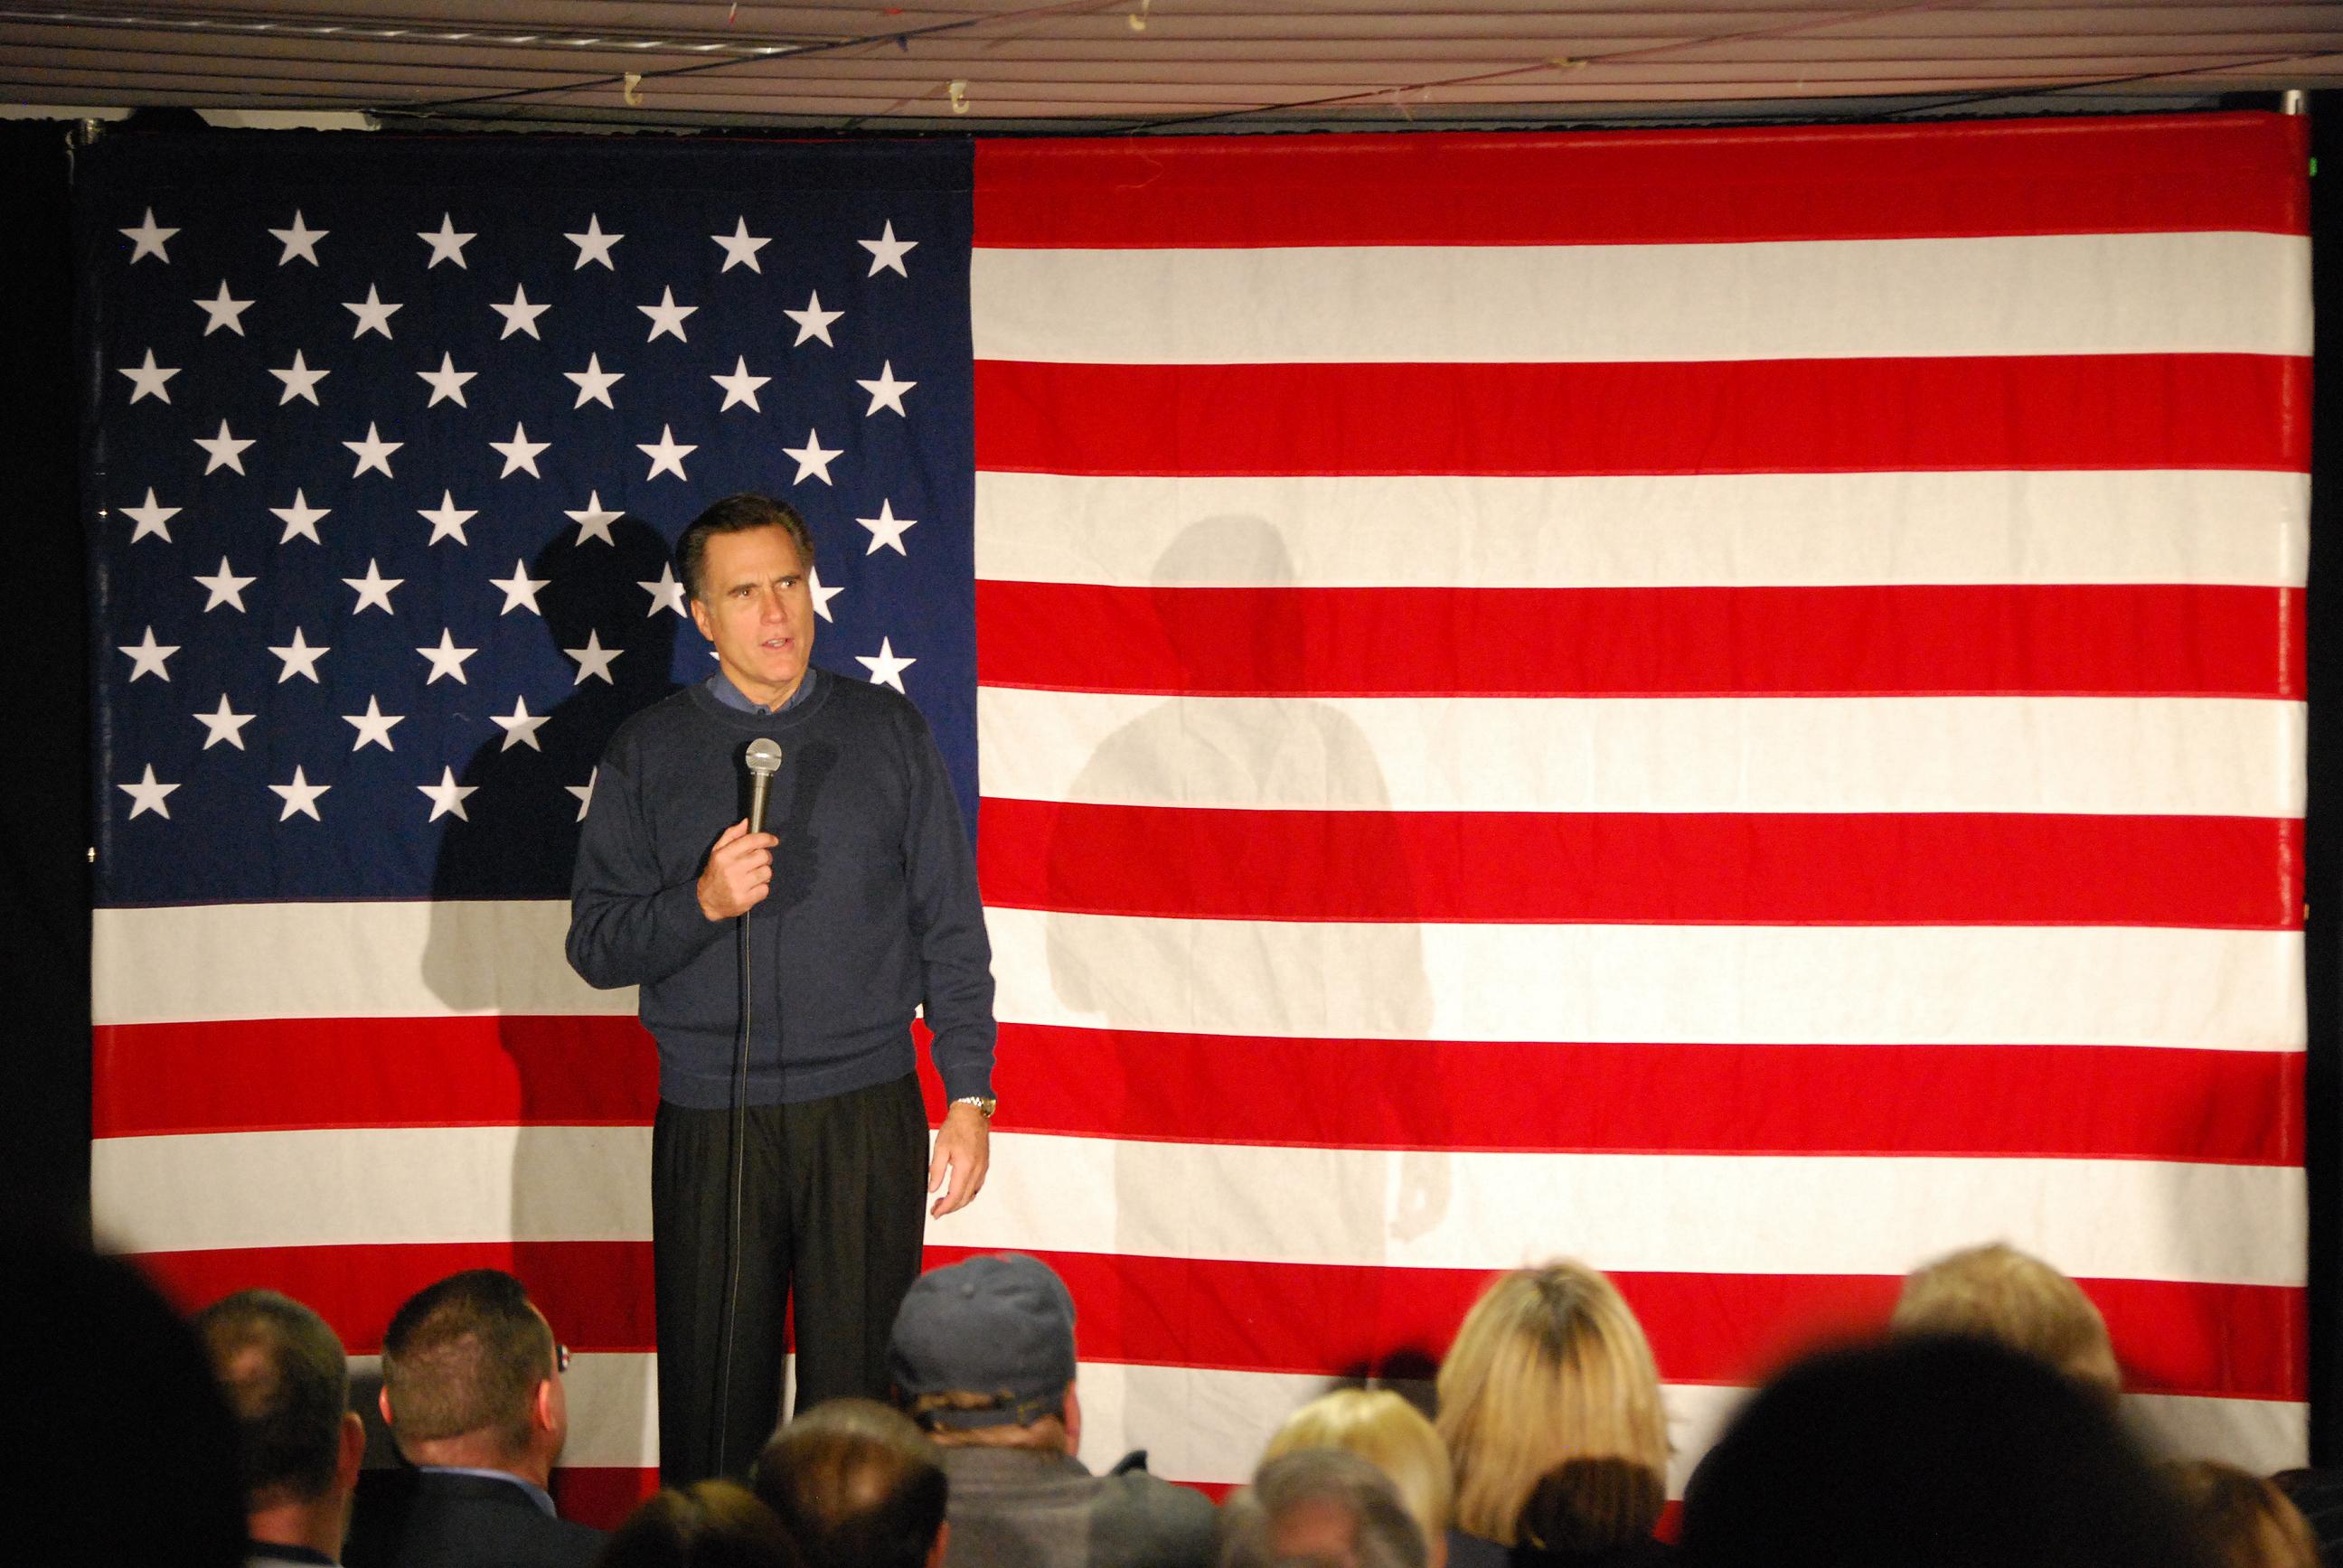 Republikán a bývalý kandidát na prezidenta Mitt Romney se bude ucházet o post senátora